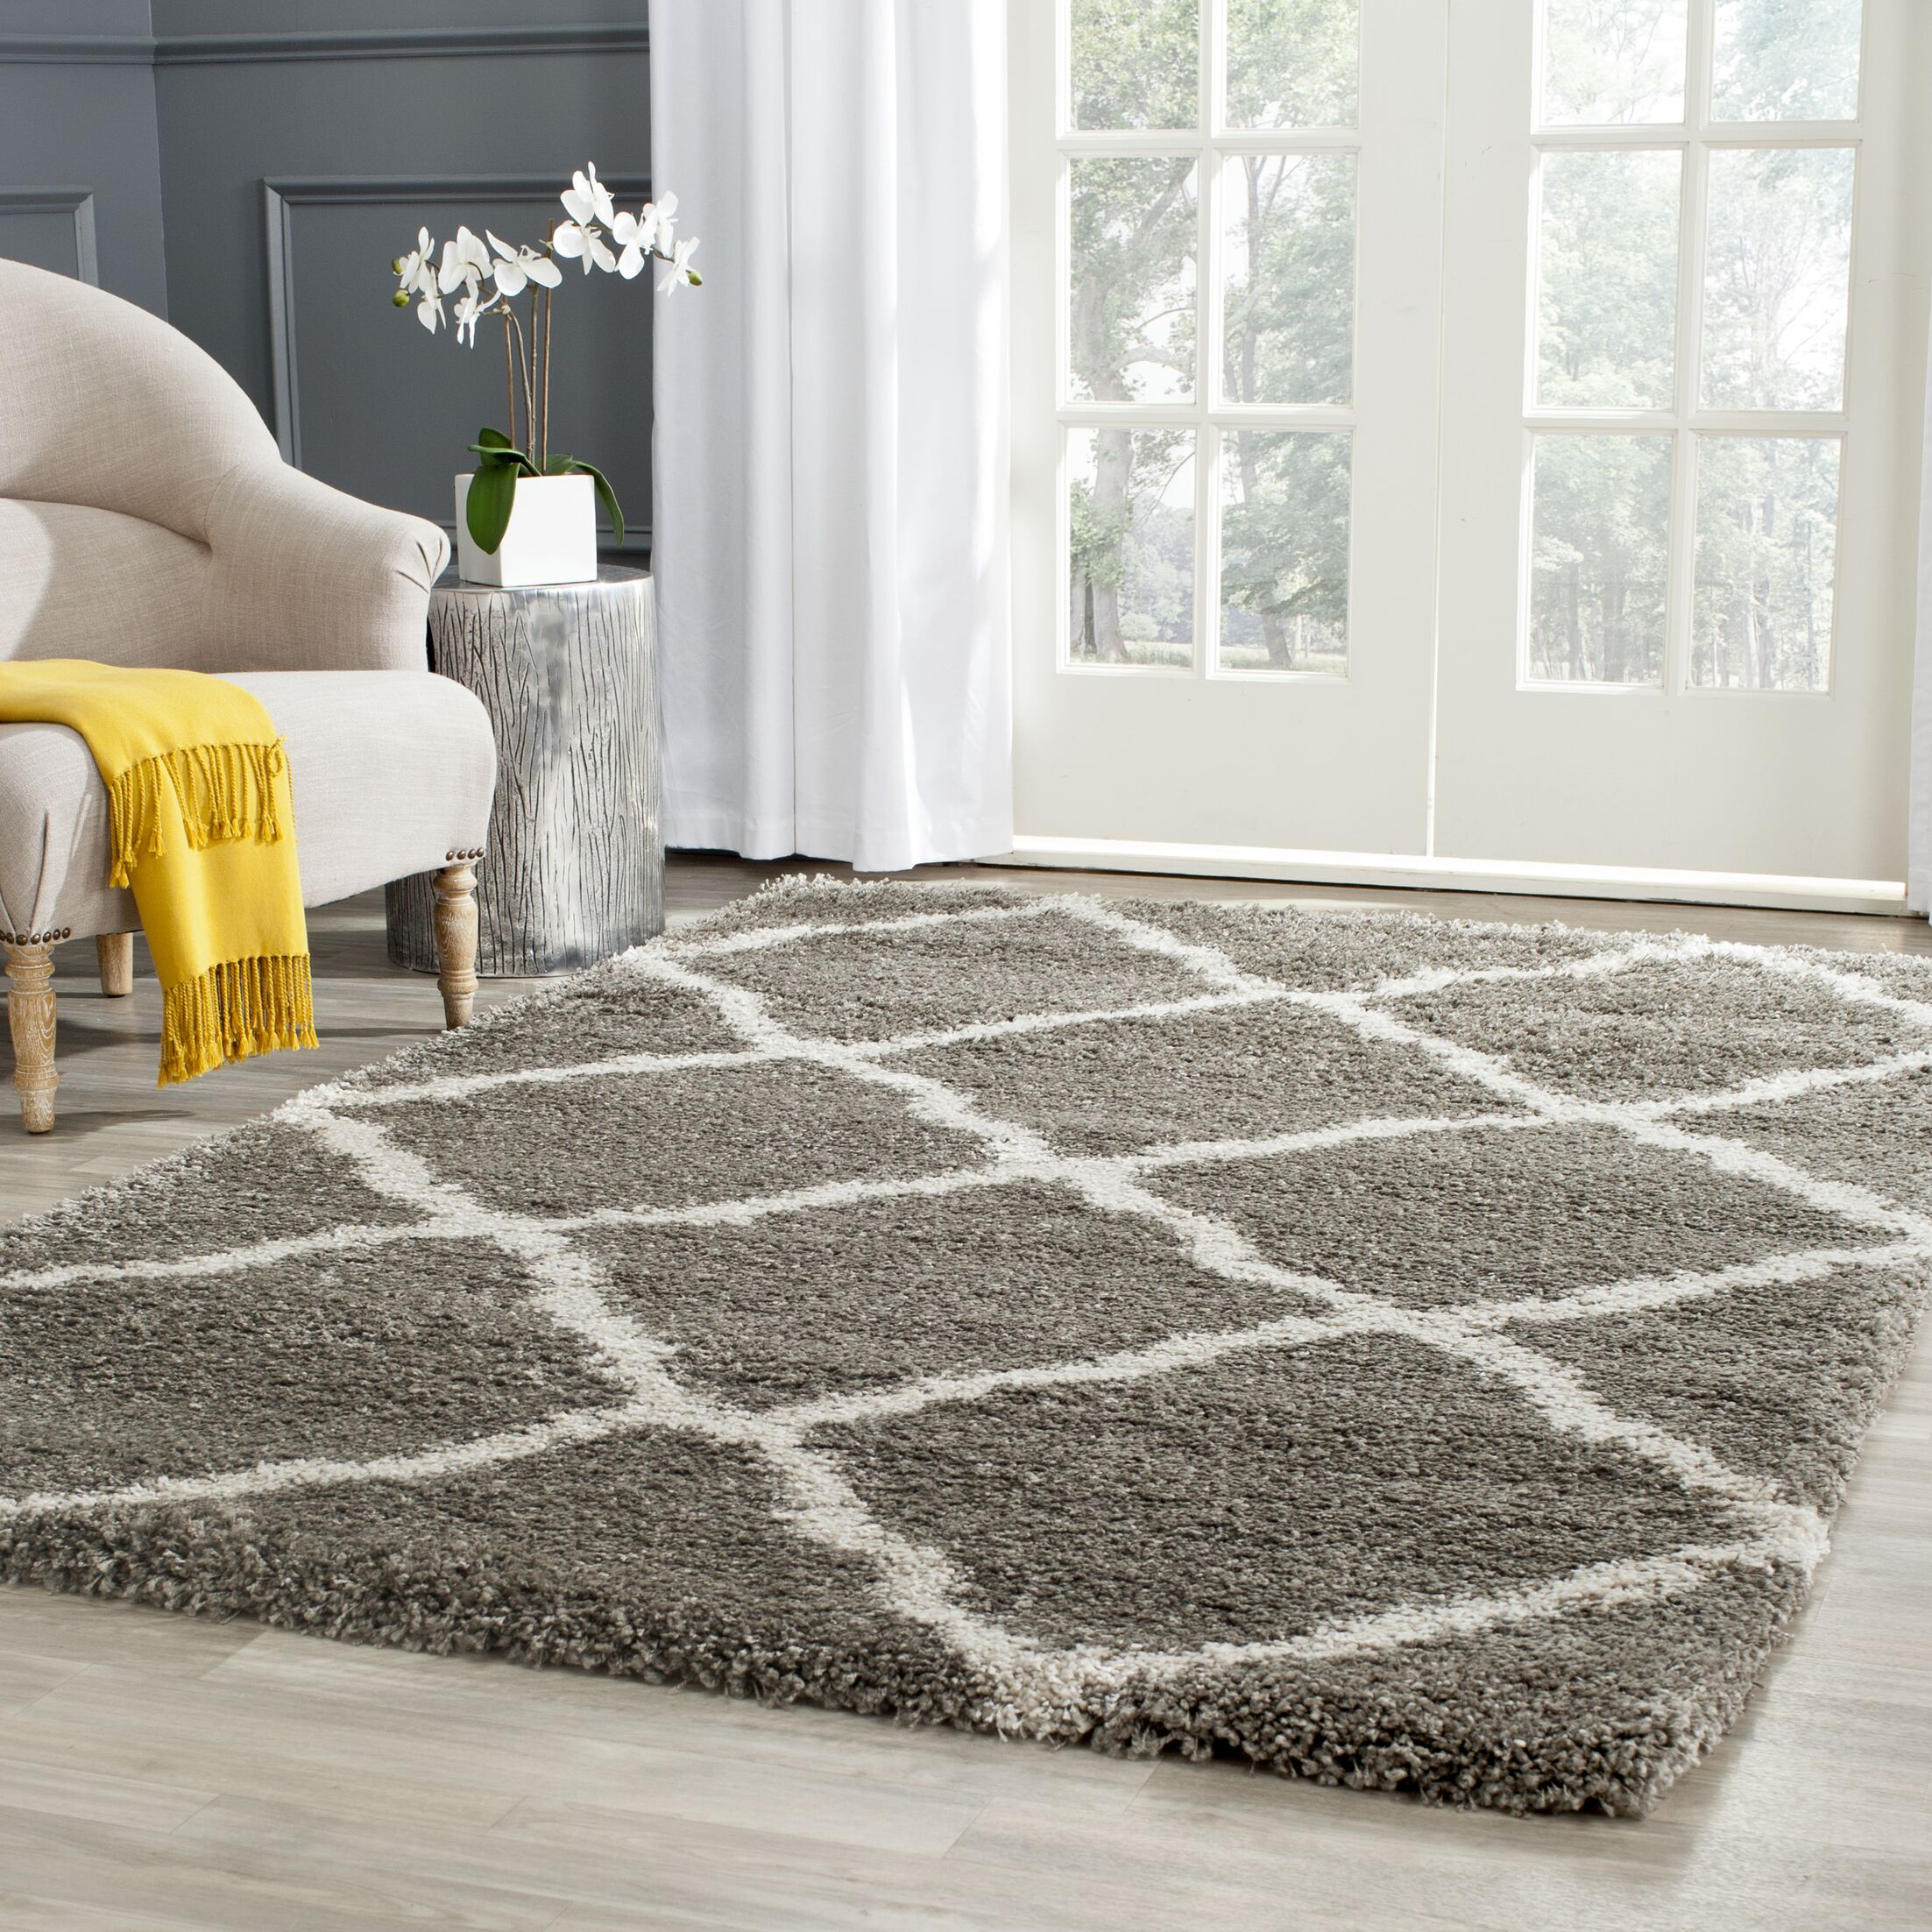 Charmain Grey & Taupe Area Rug Rug Size: Rectangle 2'3